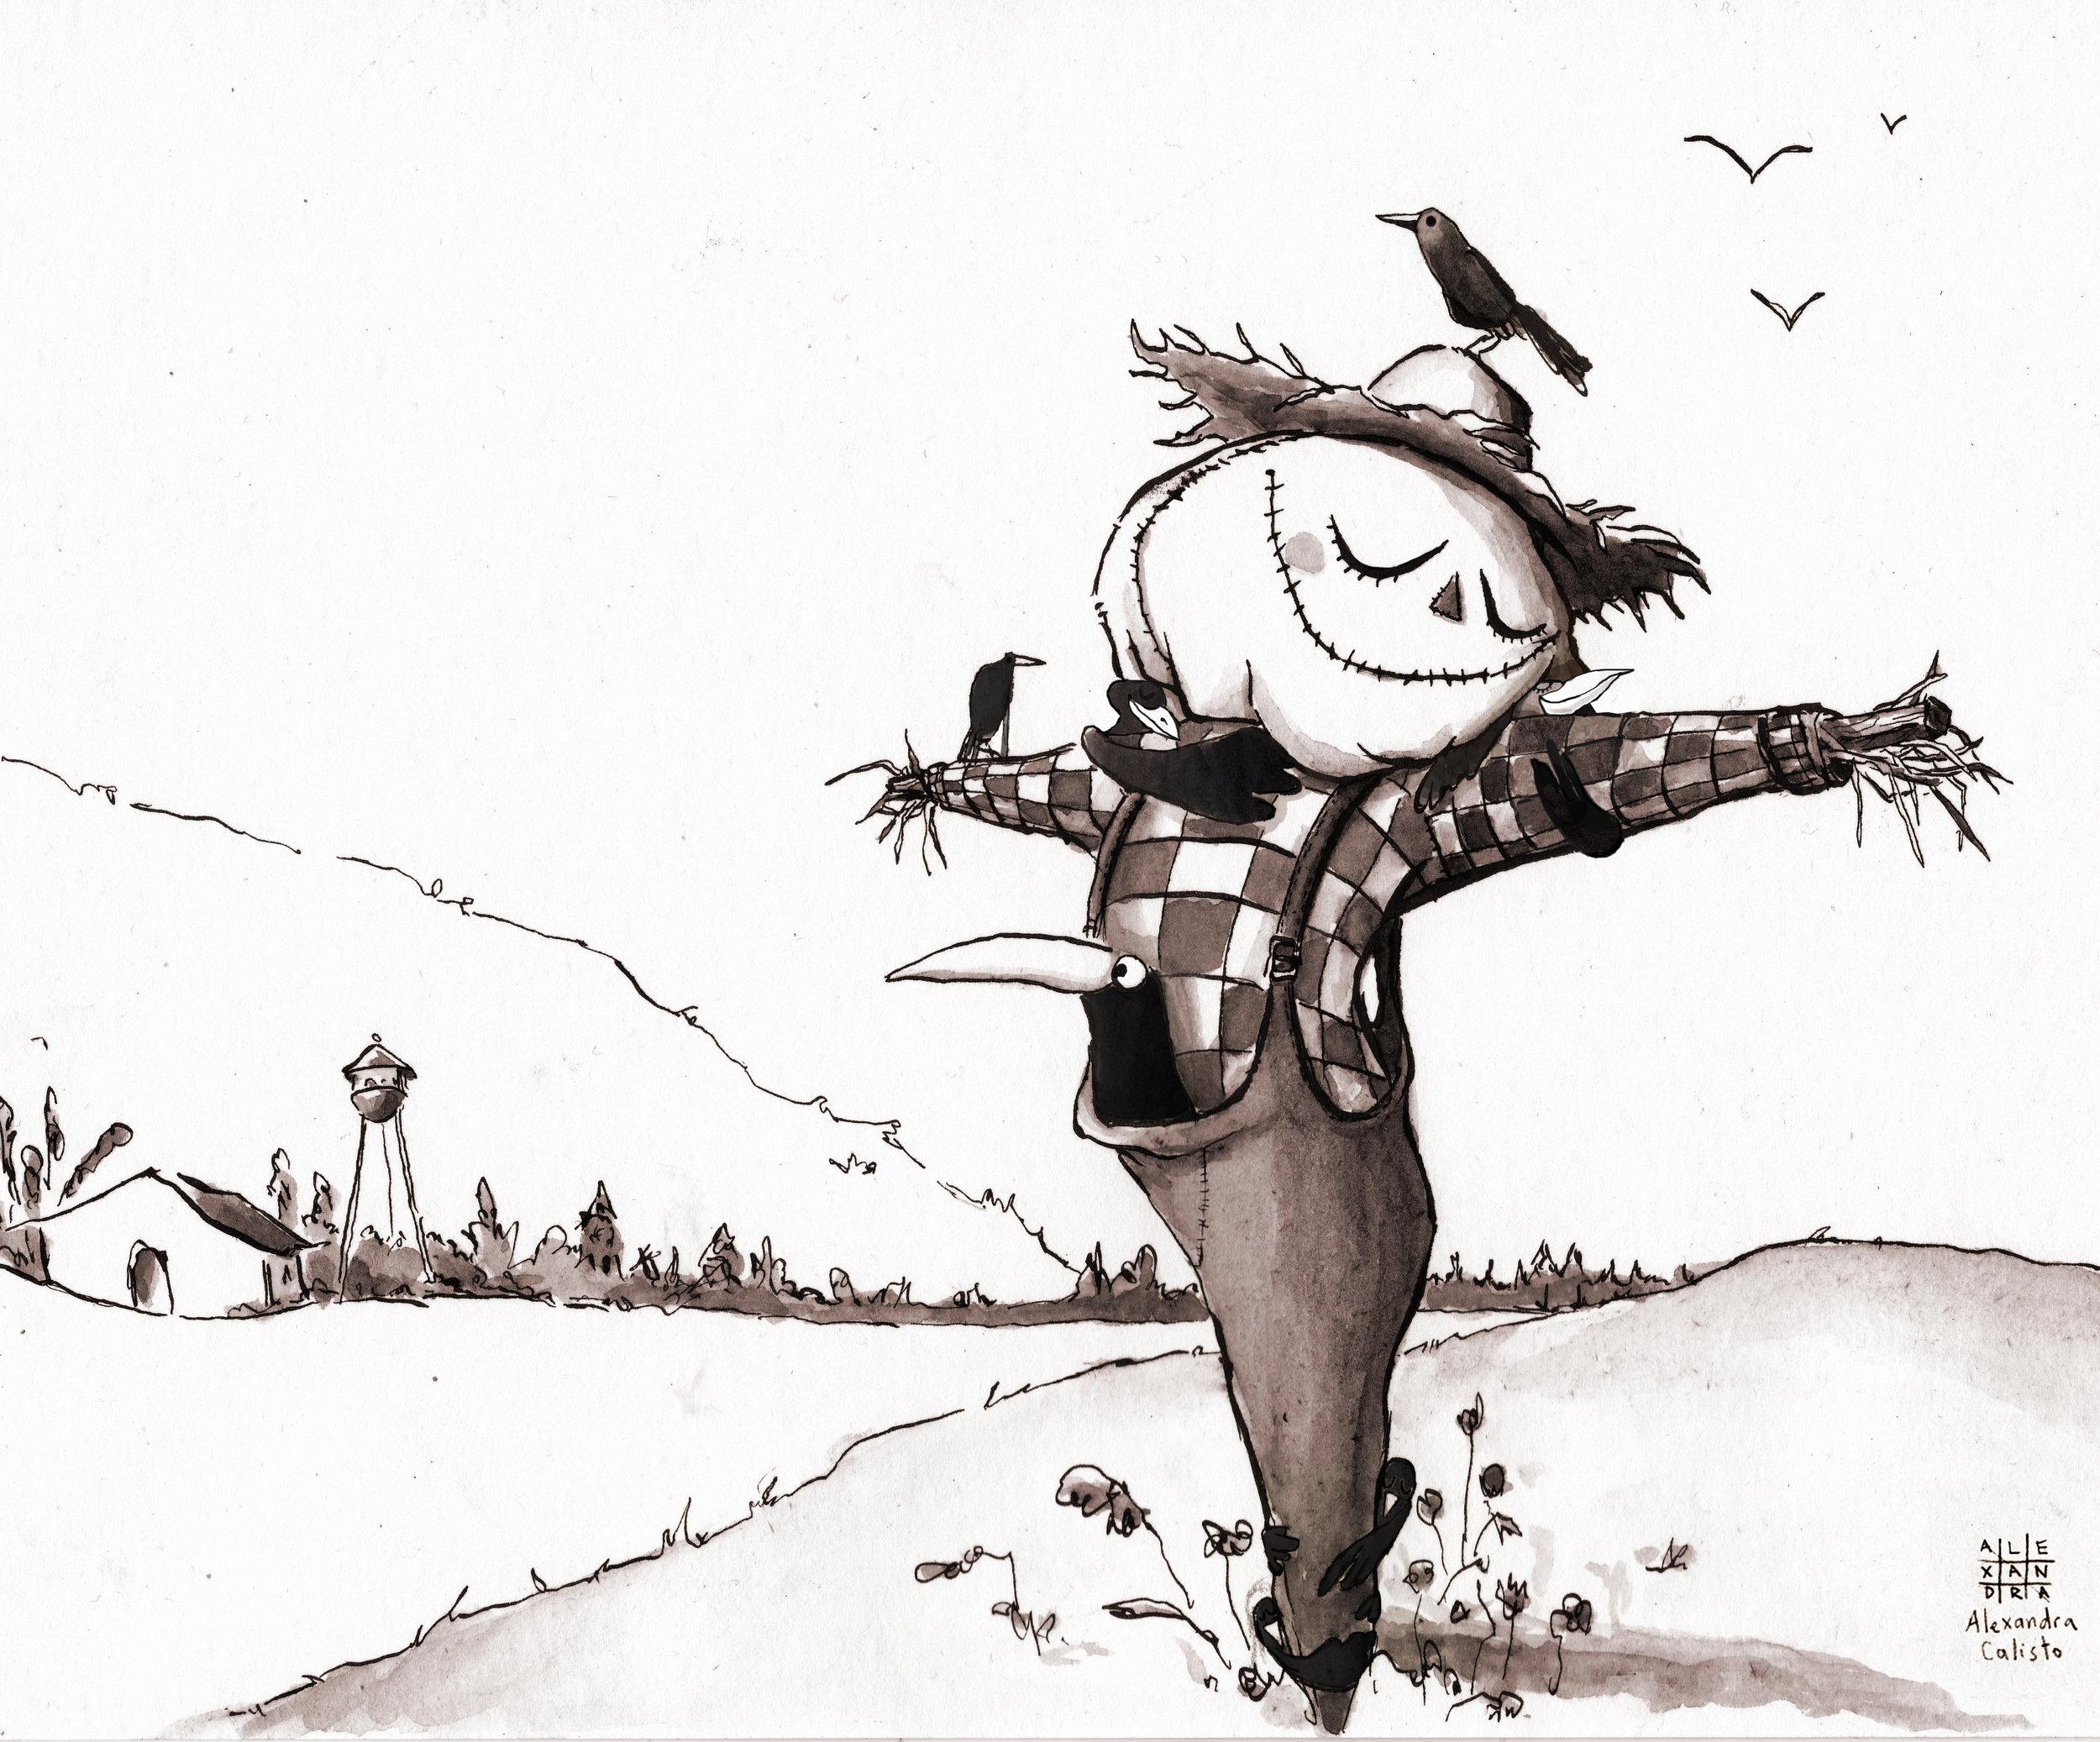 illustration, ink, inktober, tinta china, alexandra calisto, scarecrow